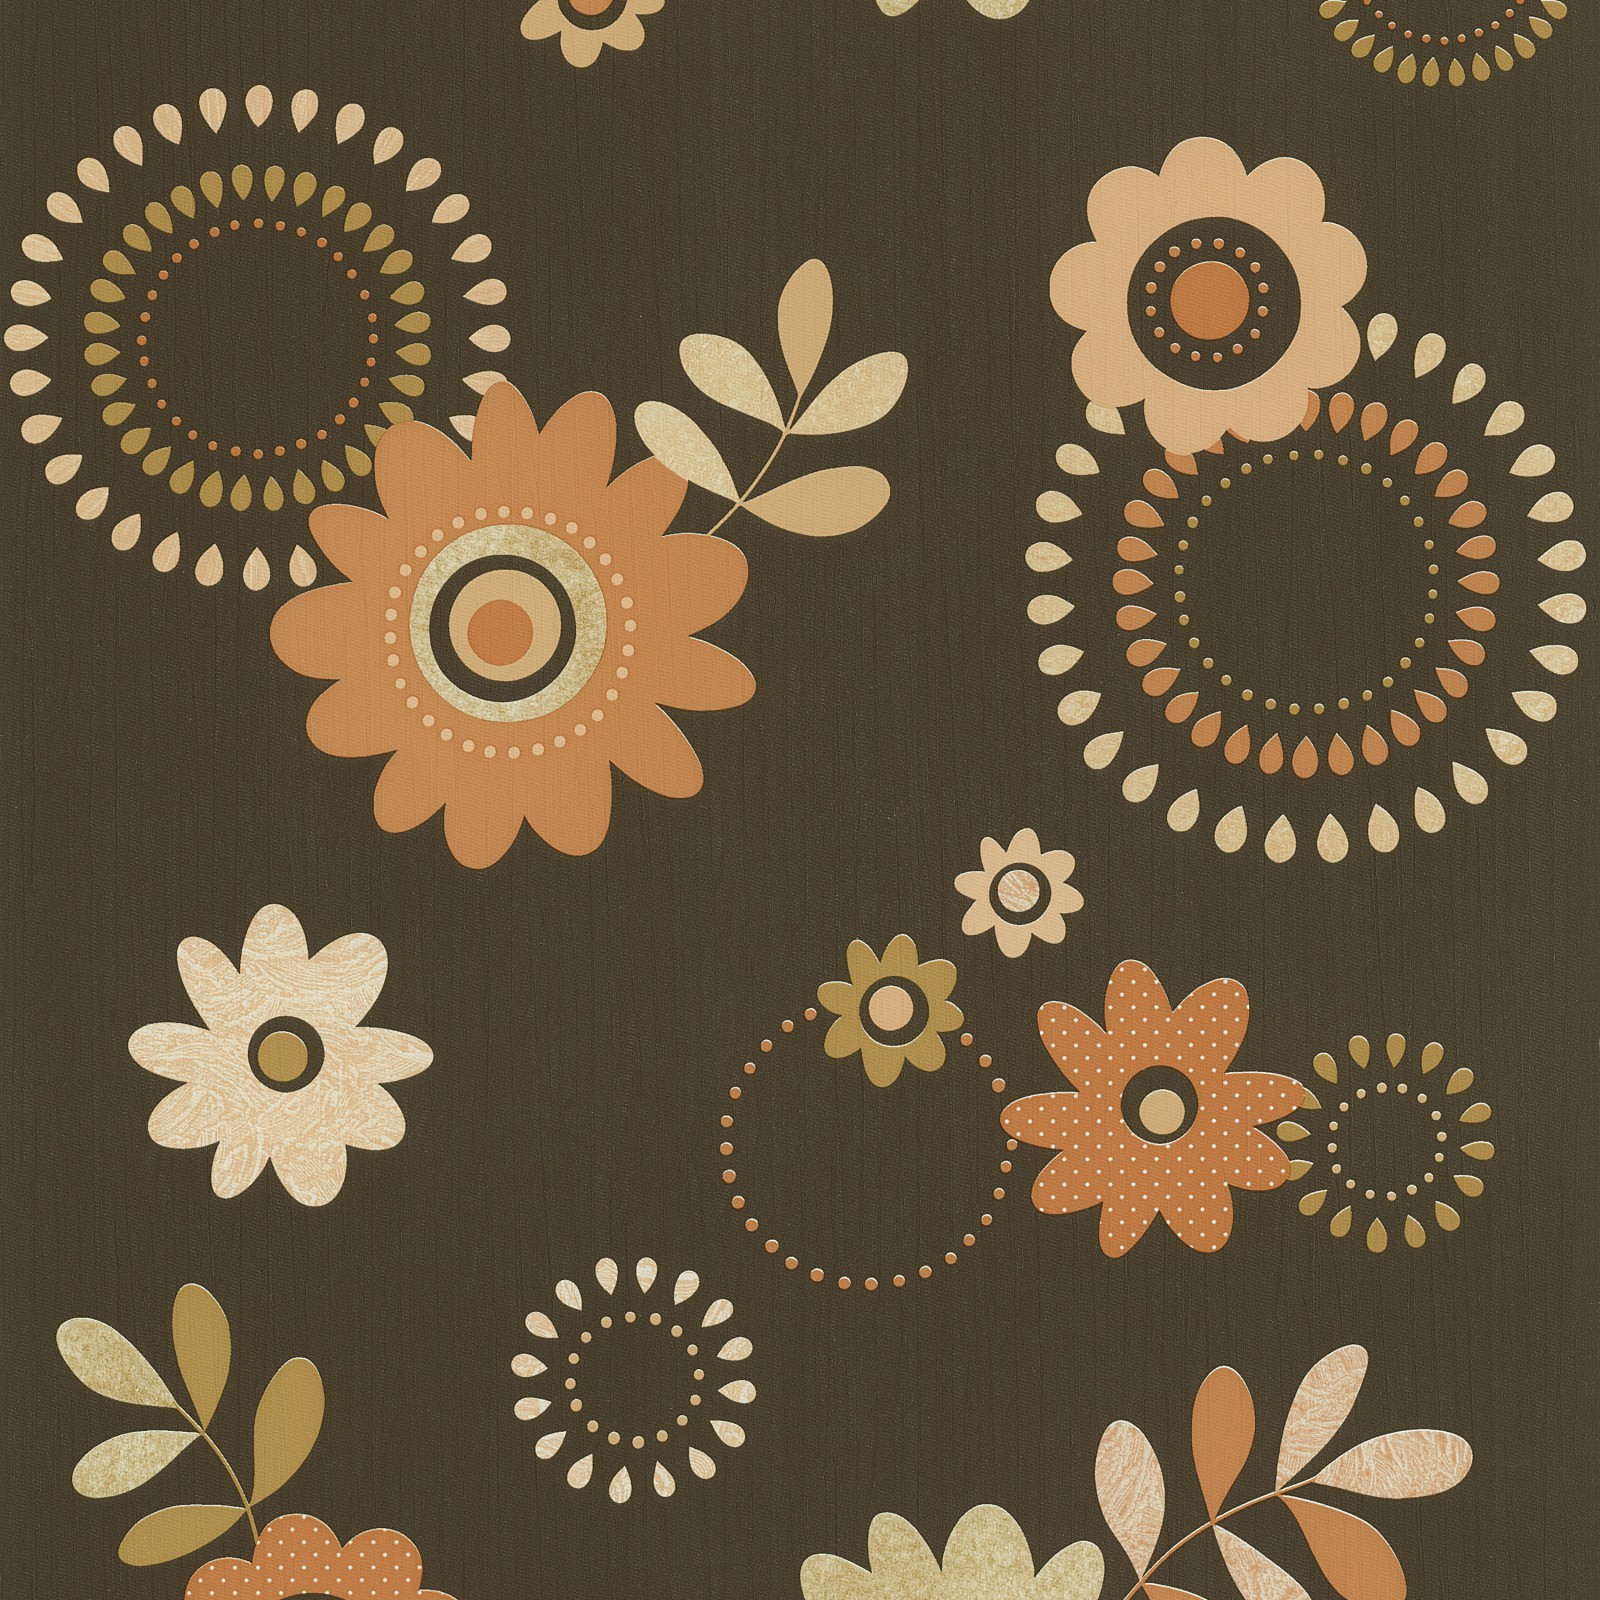 tapete braun orange blumen p s 05560 30. Black Bedroom Furniture Sets. Home Design Ideas